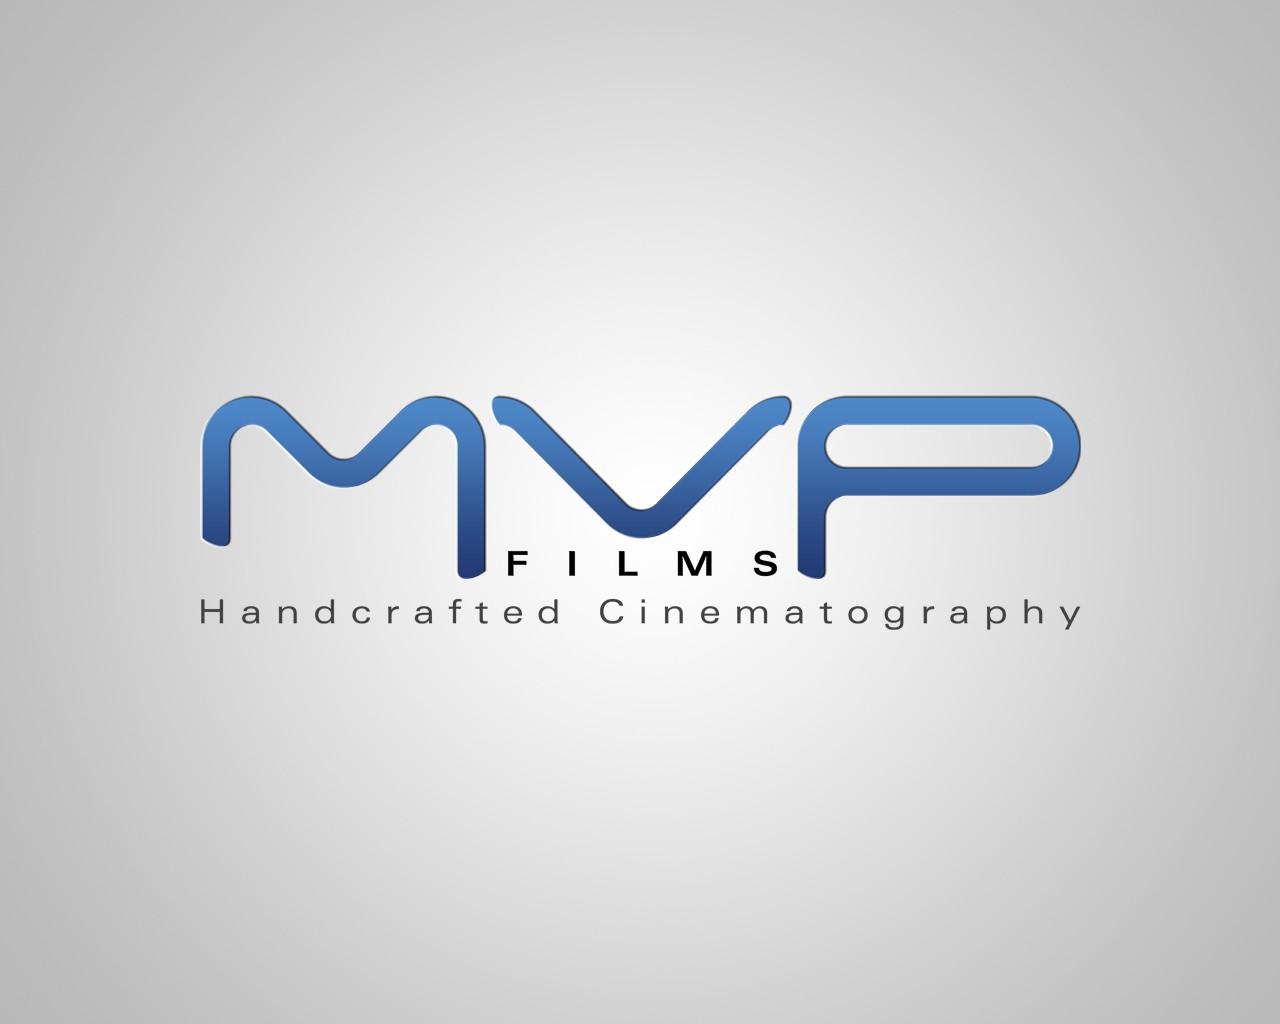 MVP Films needs a new logo